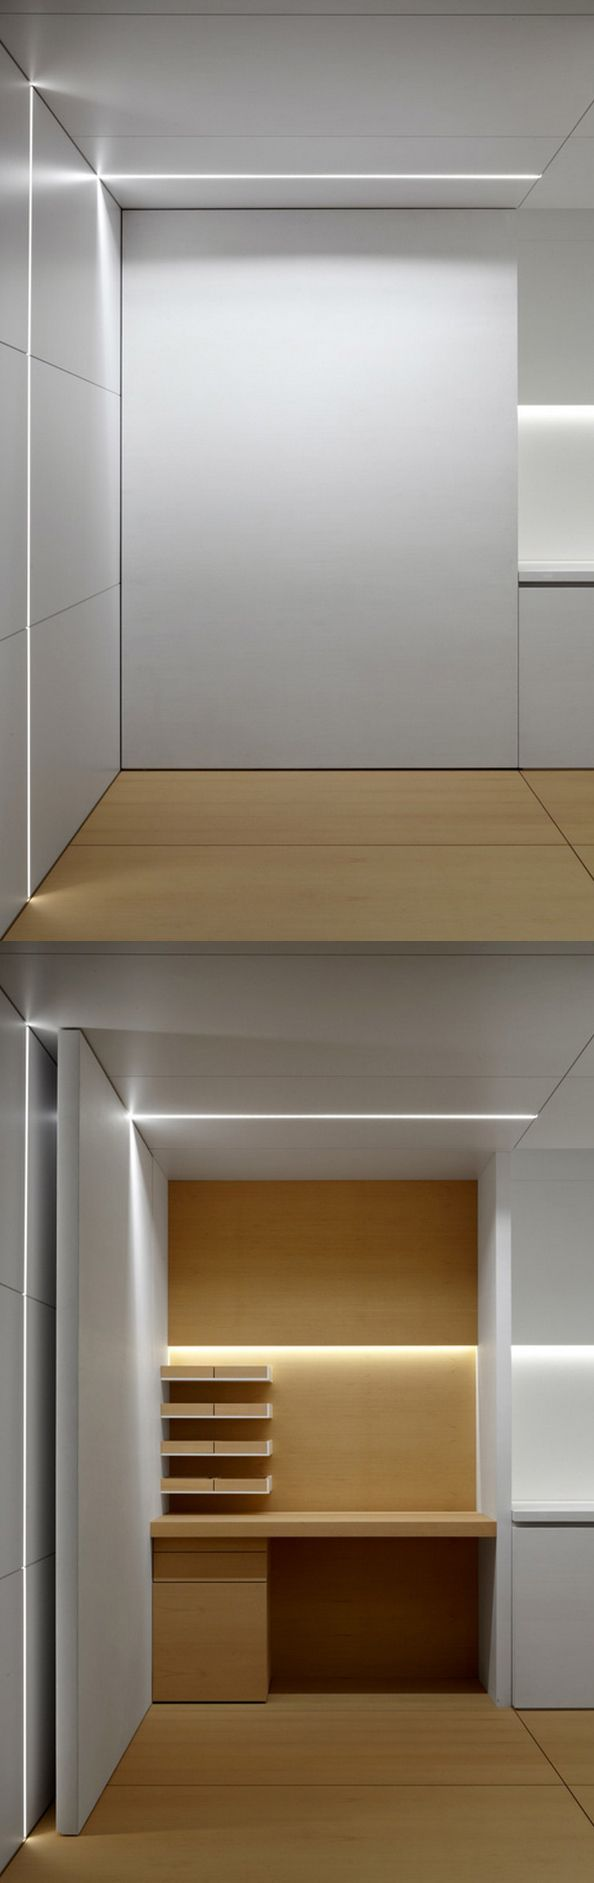 Large door hiding cupboard inside the Minus showroom kitchen at the Interieur 2012 fair.